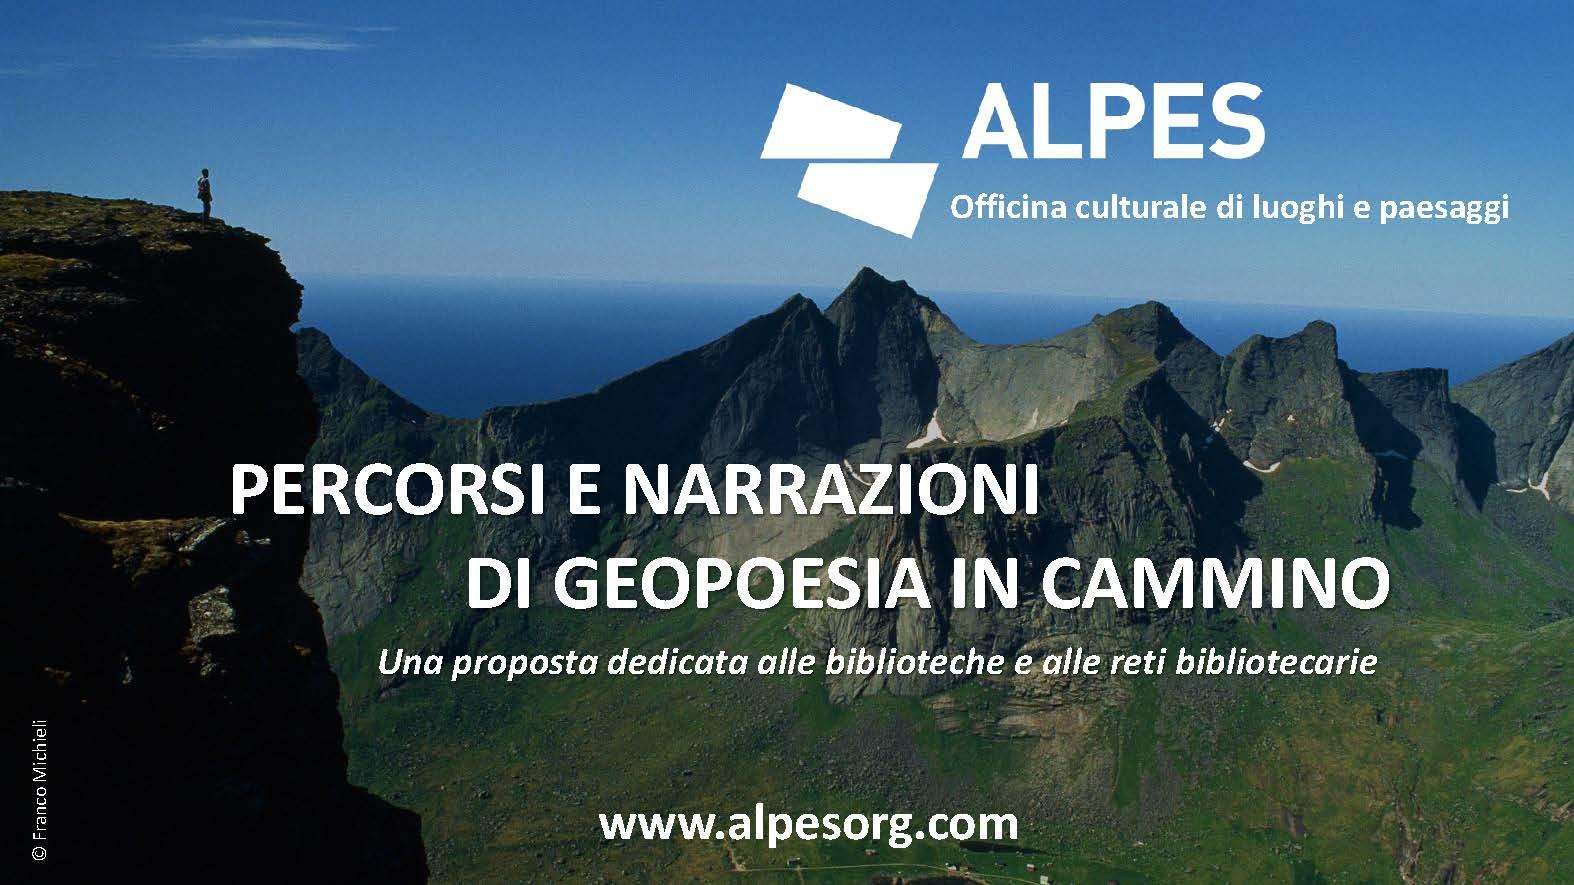 Percorsi e narrazioni di geopesia in cammino - Alpes_Pagina_01.jpg